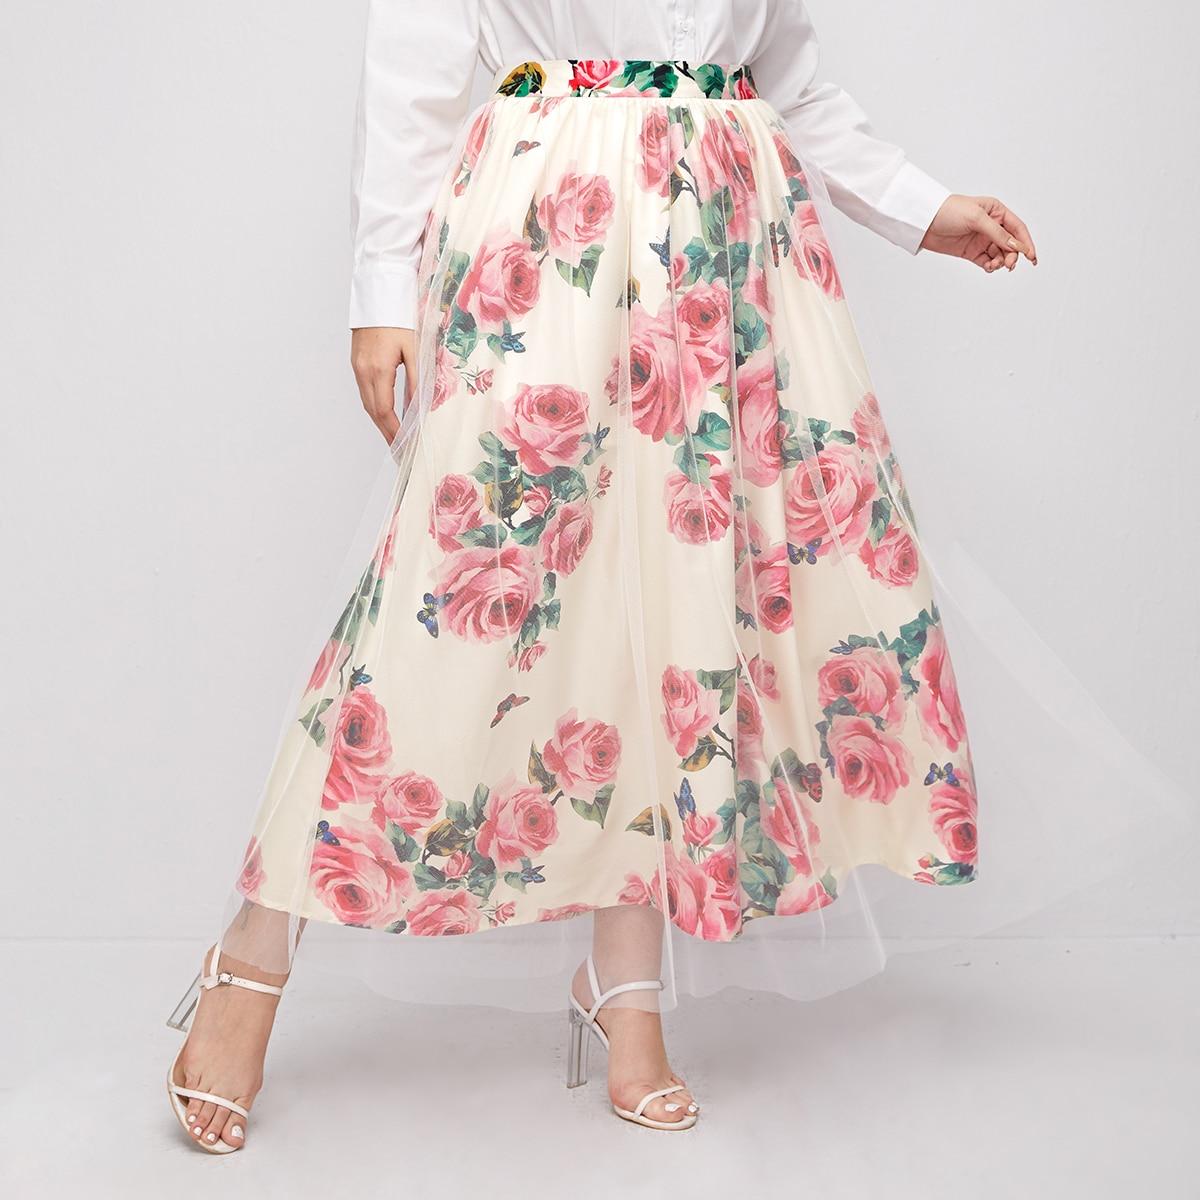 SHEIN / Plus Big Floral Mesh Overlay Skirt